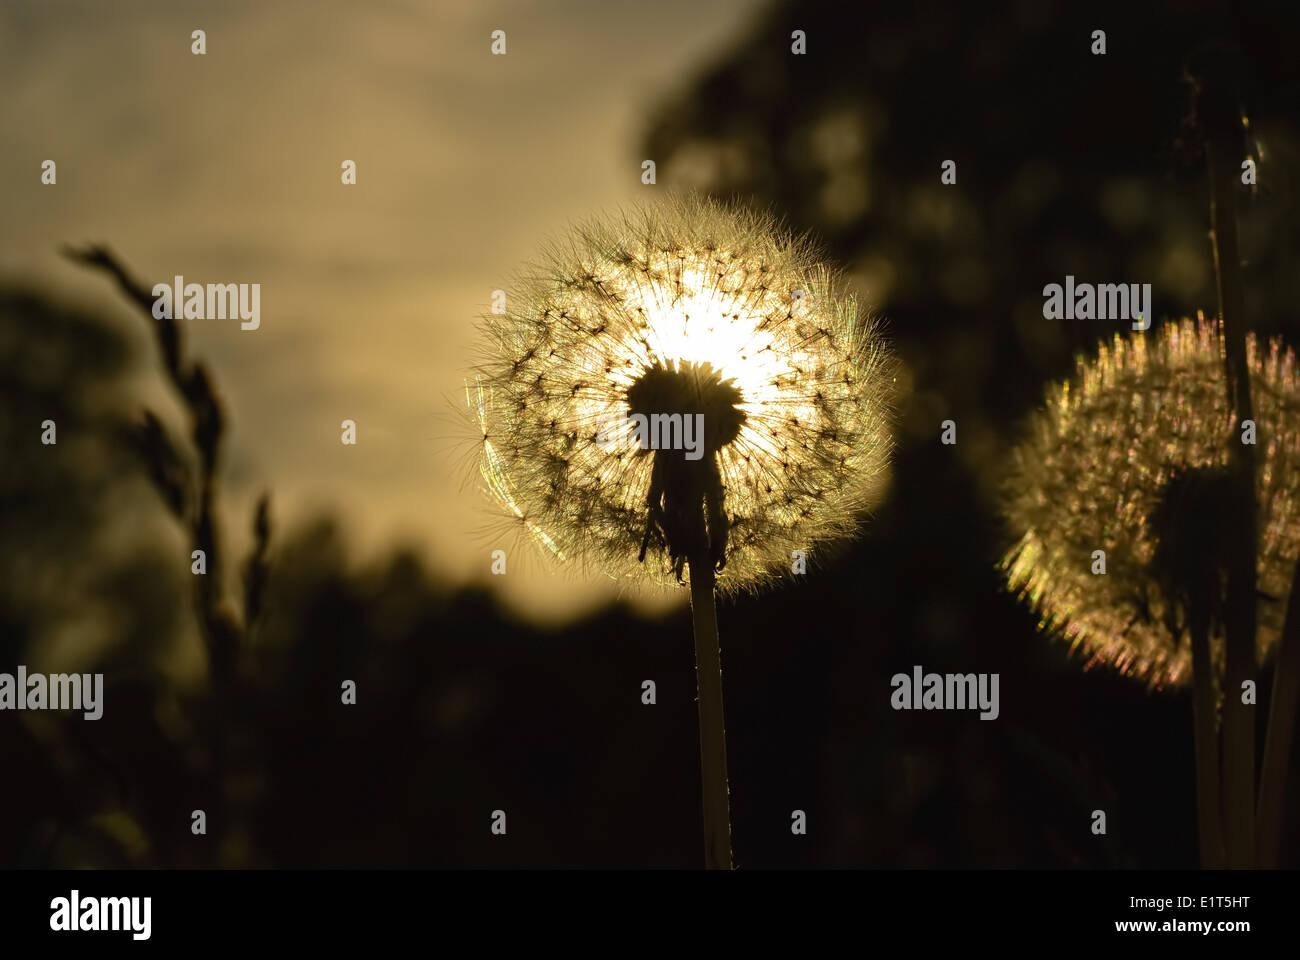 Sunny dandelion lit by the evening sun - Stock Image